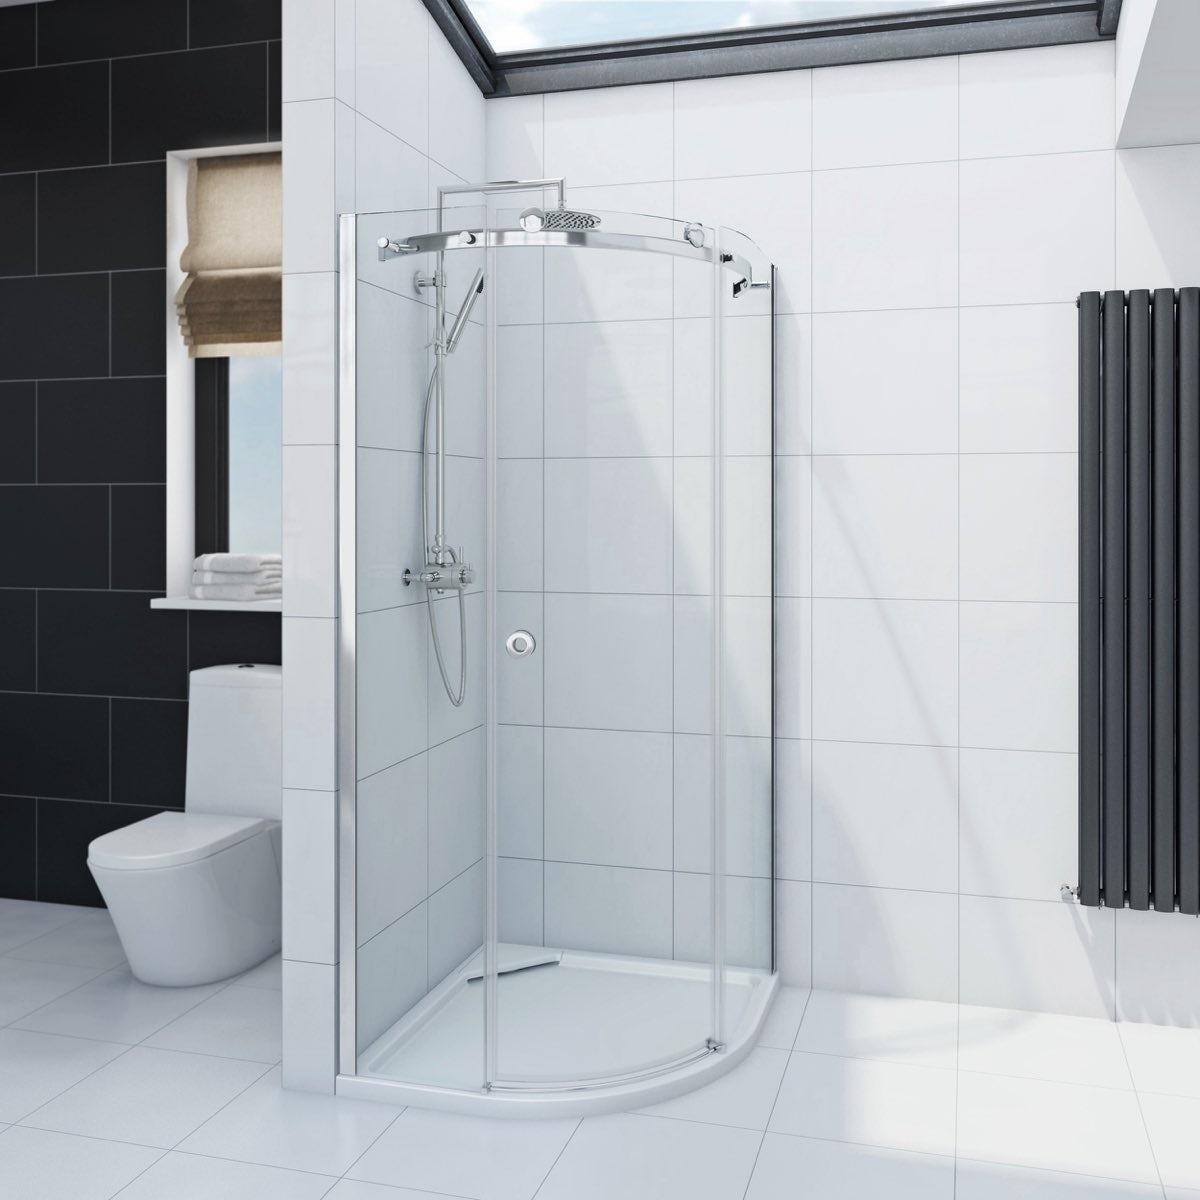 Shower Enclosure Buying Guide | VictoriaPlum.com